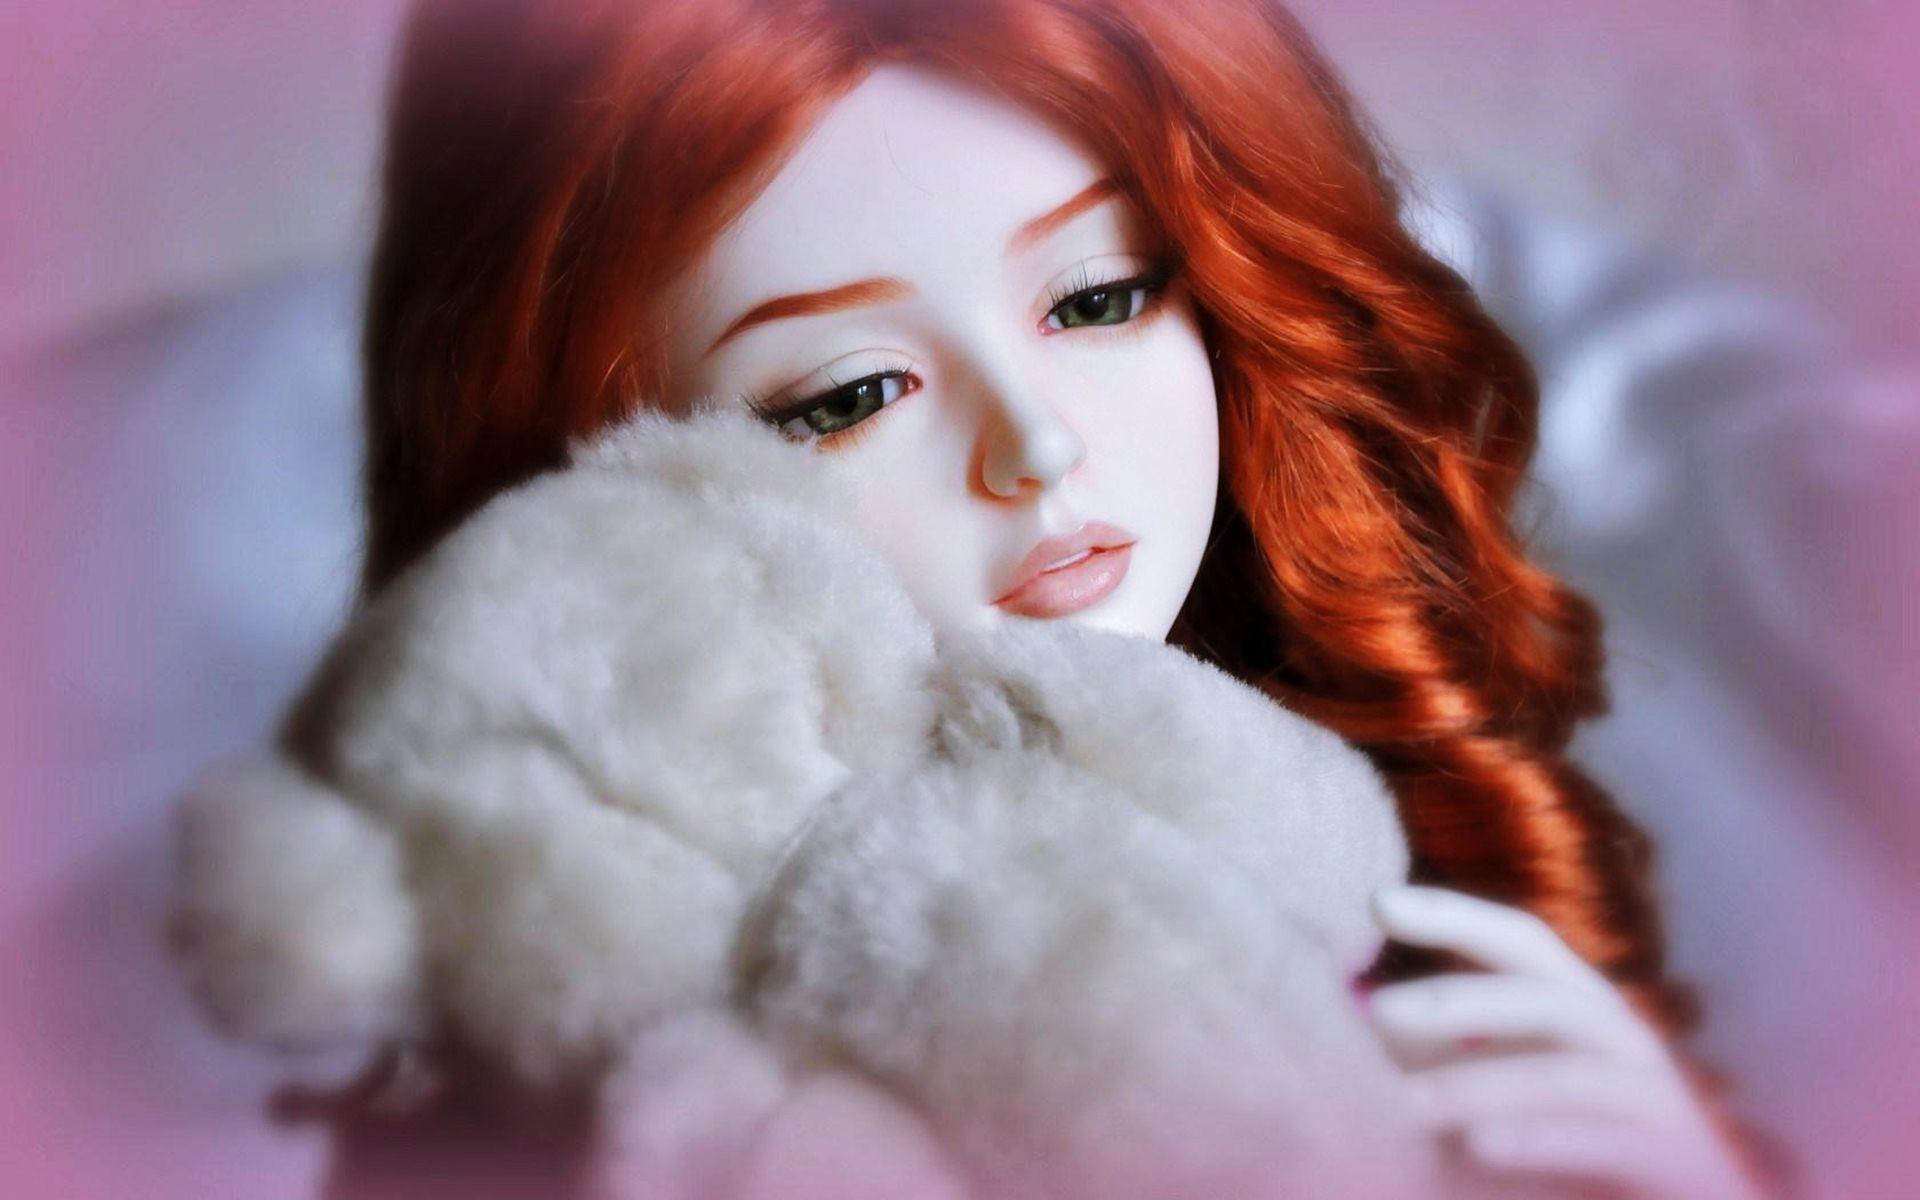 Profile pic of barbie doll Teddy full HD Image Rocks wallpaper hd 1920x1200